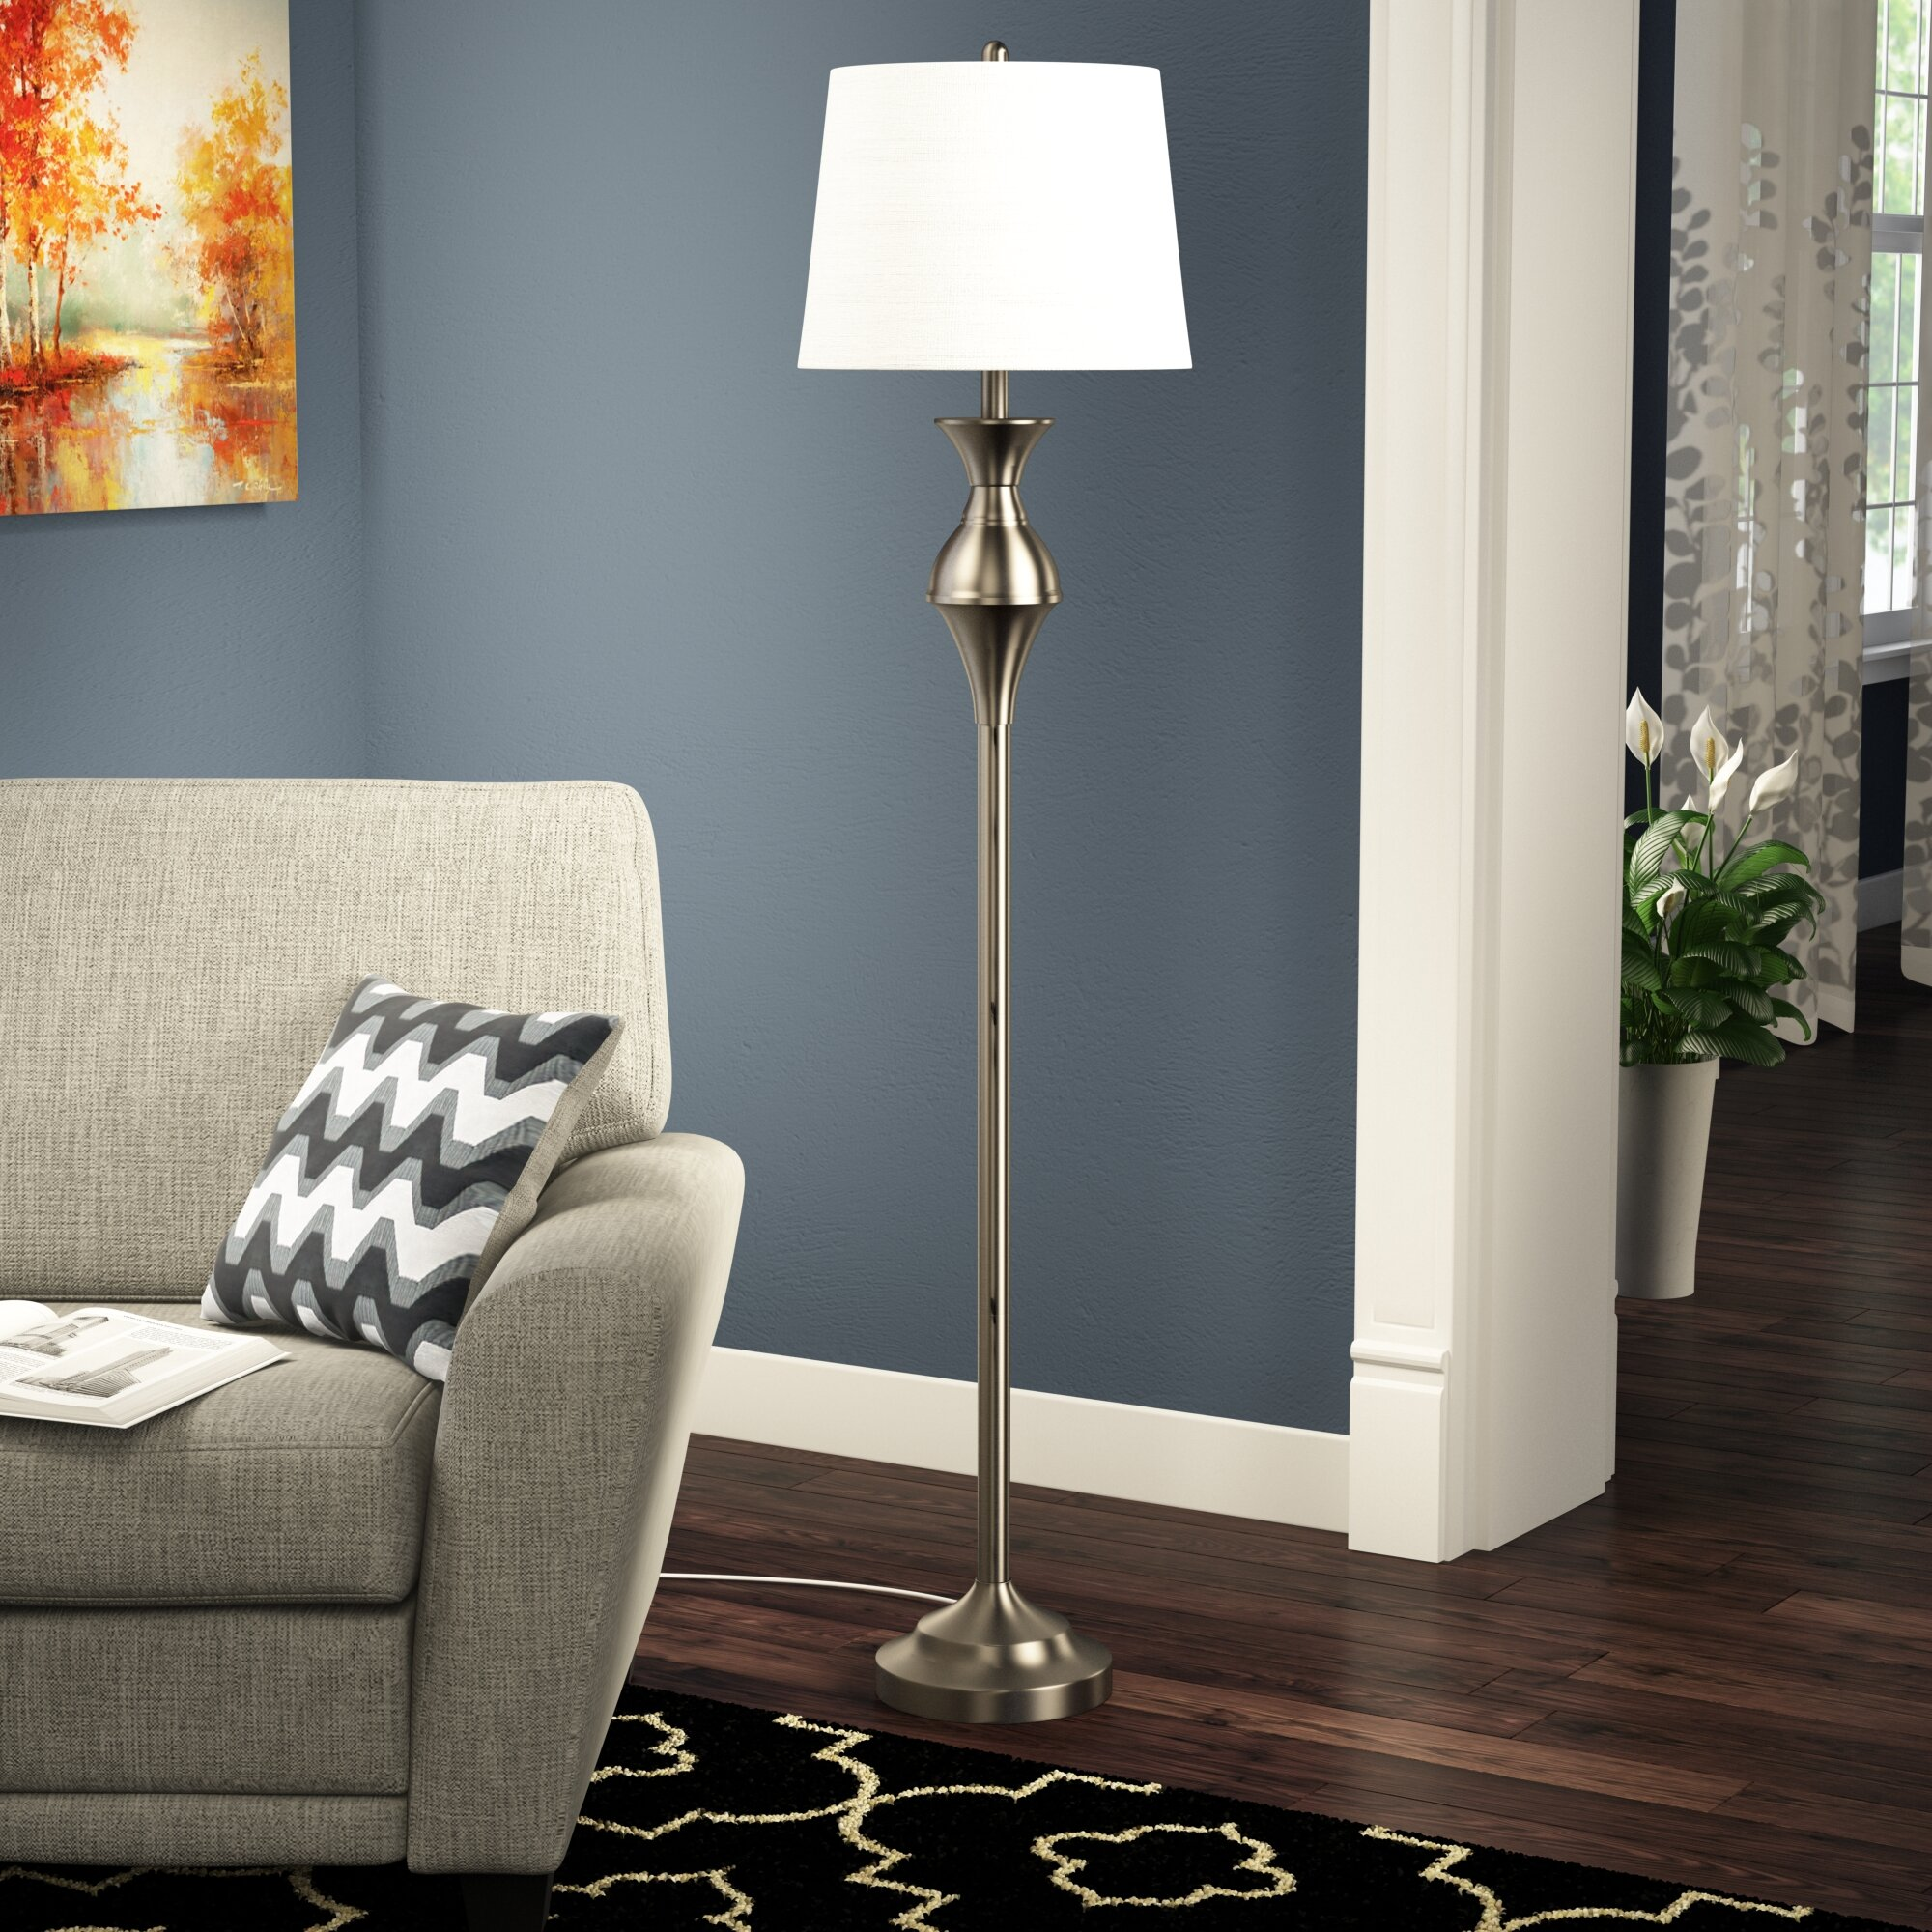 Floor Lamps  Free Shipping Over $10  Wayfair